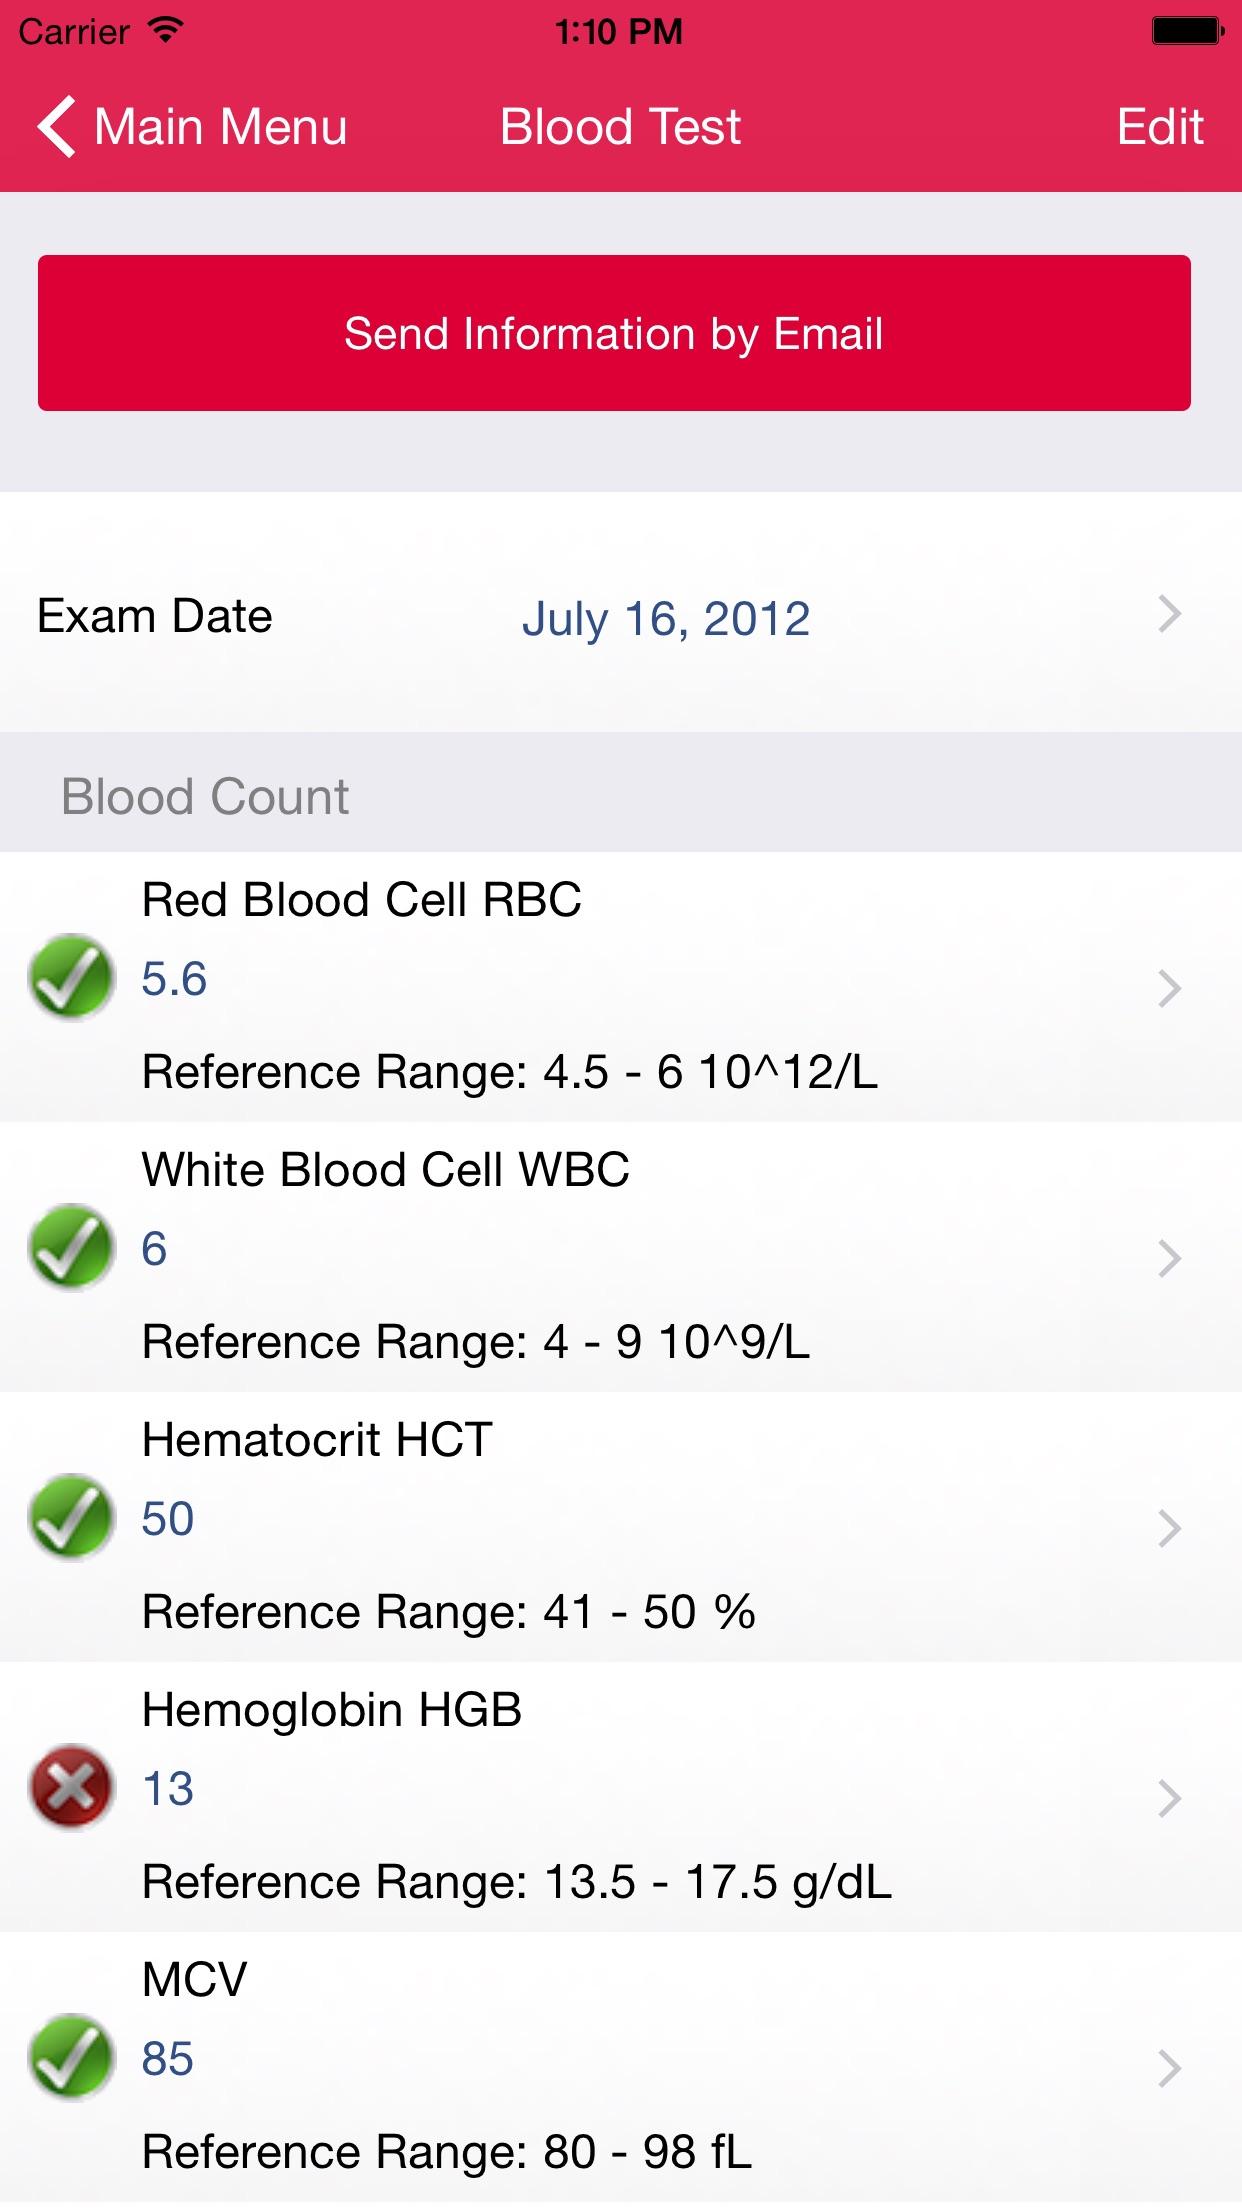 My Blood Test Screenshot